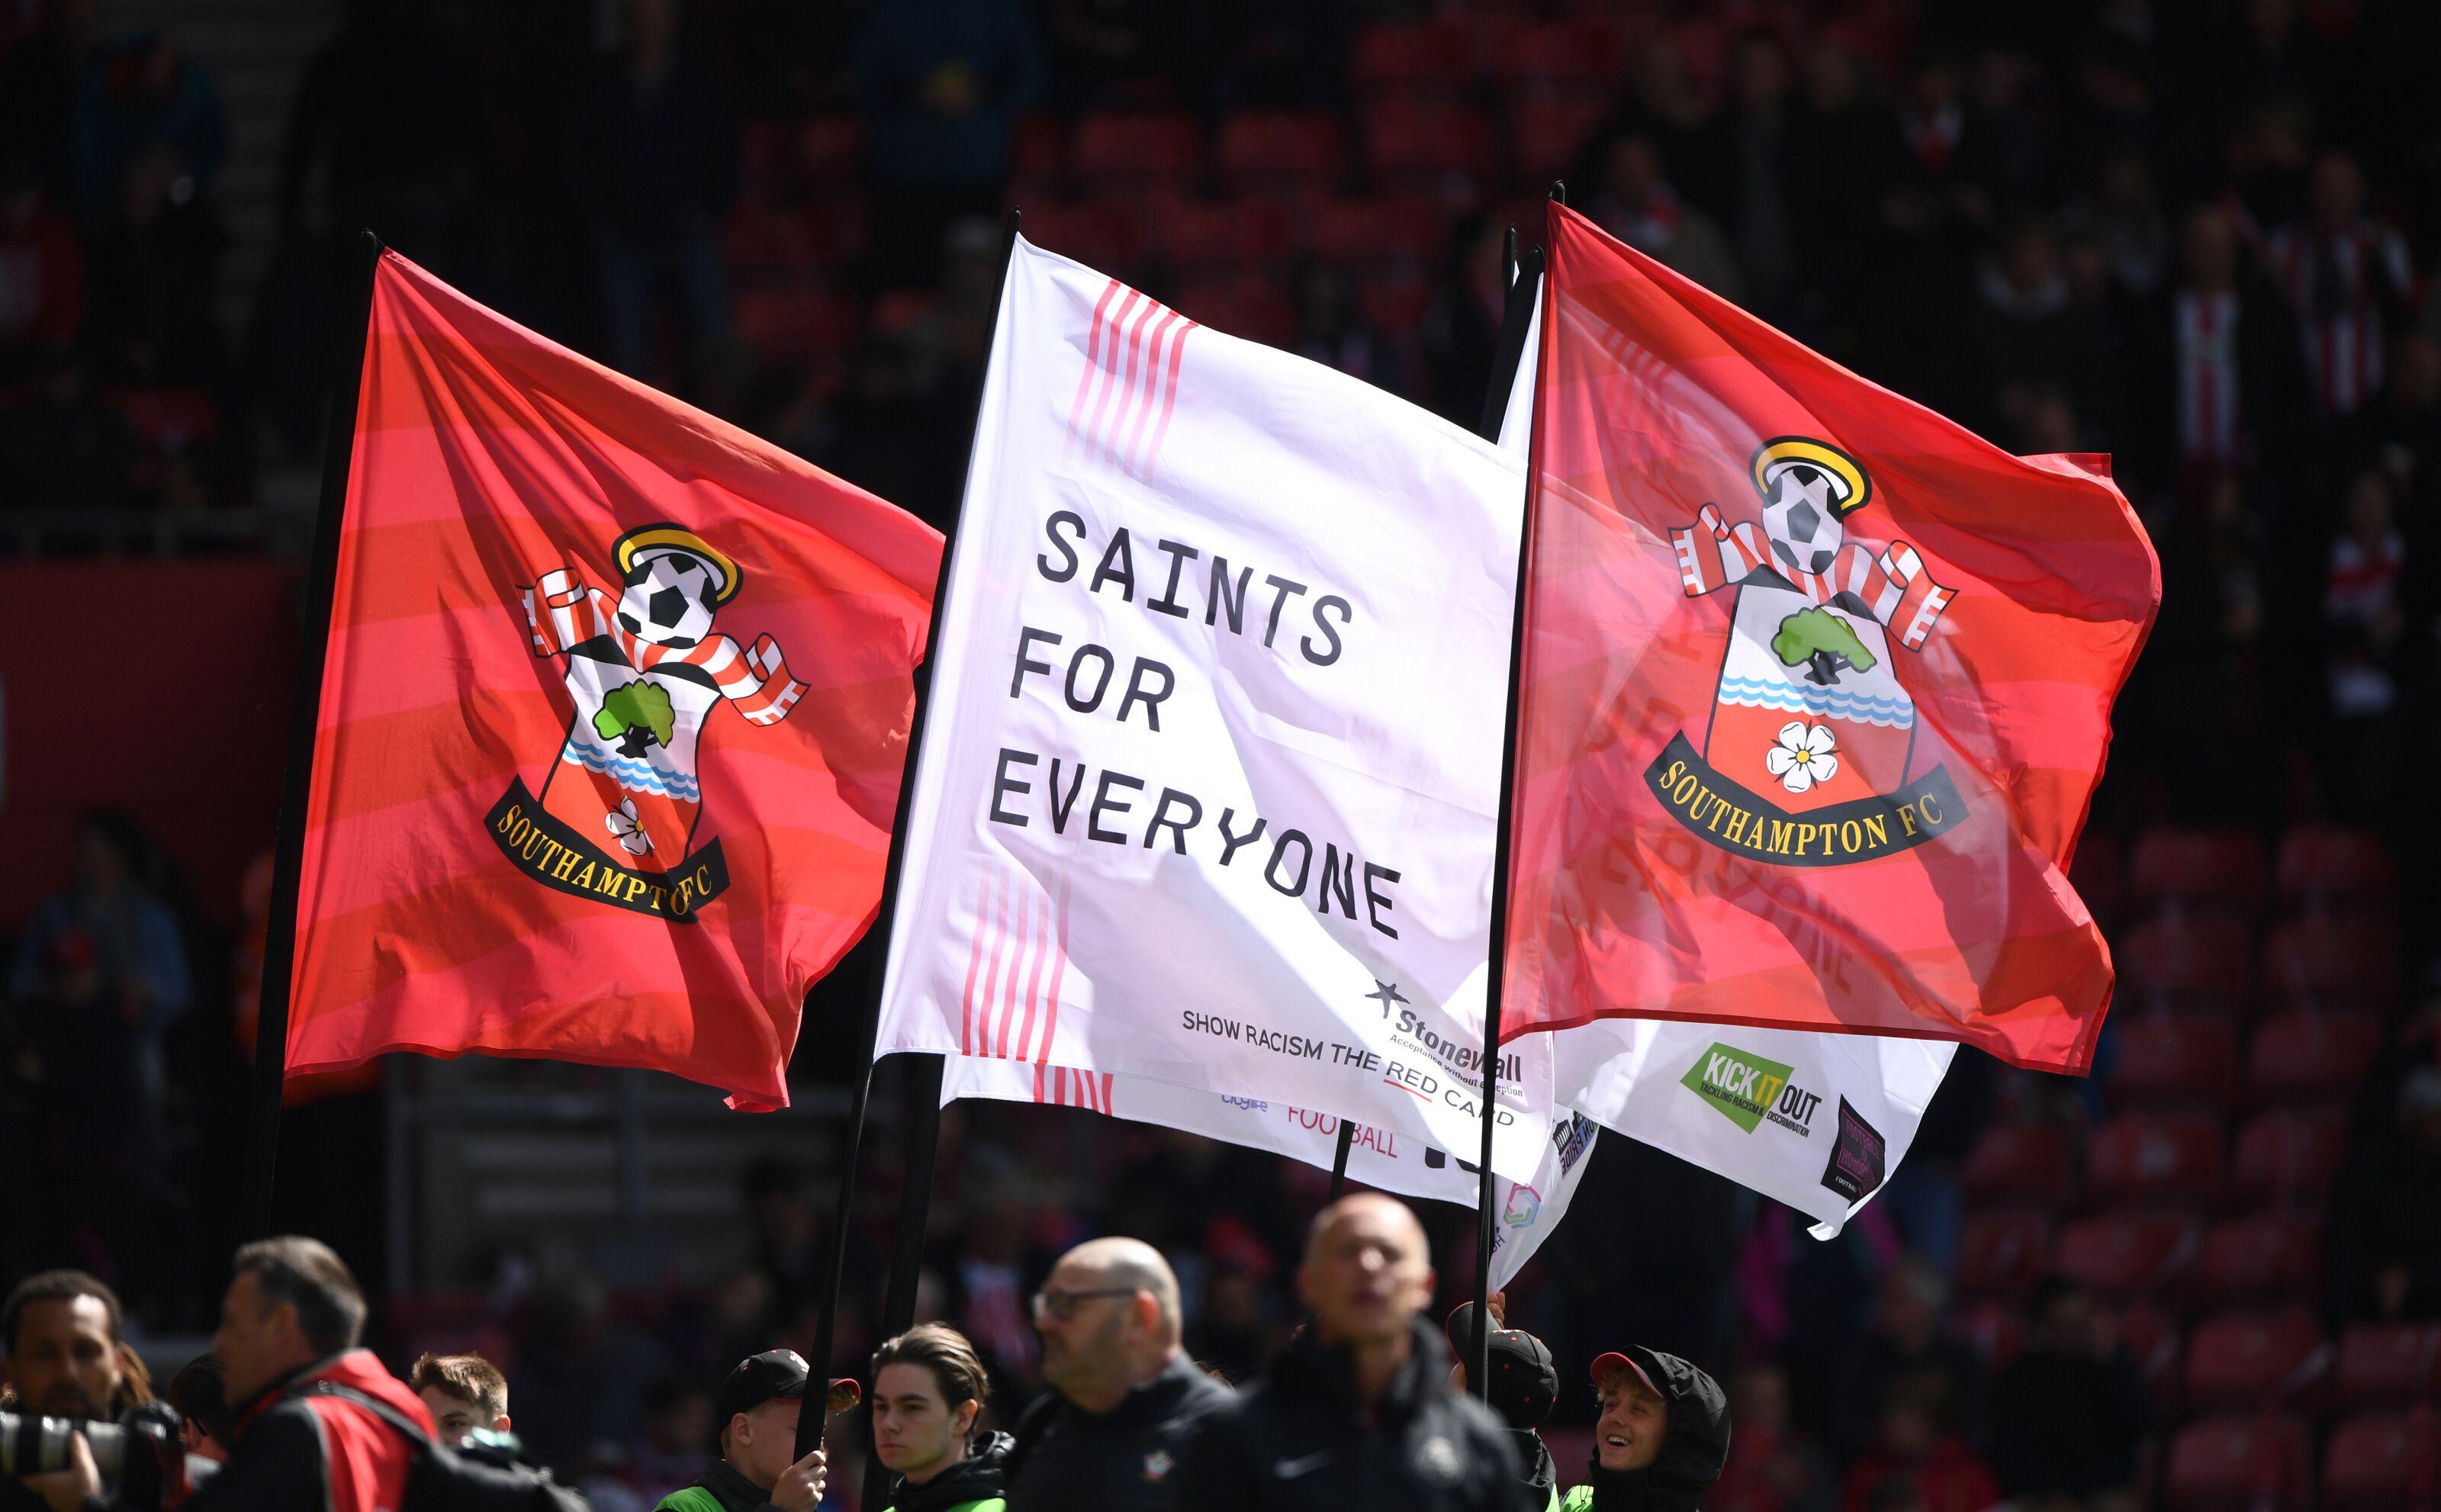 Southampton: Saints Women's fixtures for 2019/20 season released